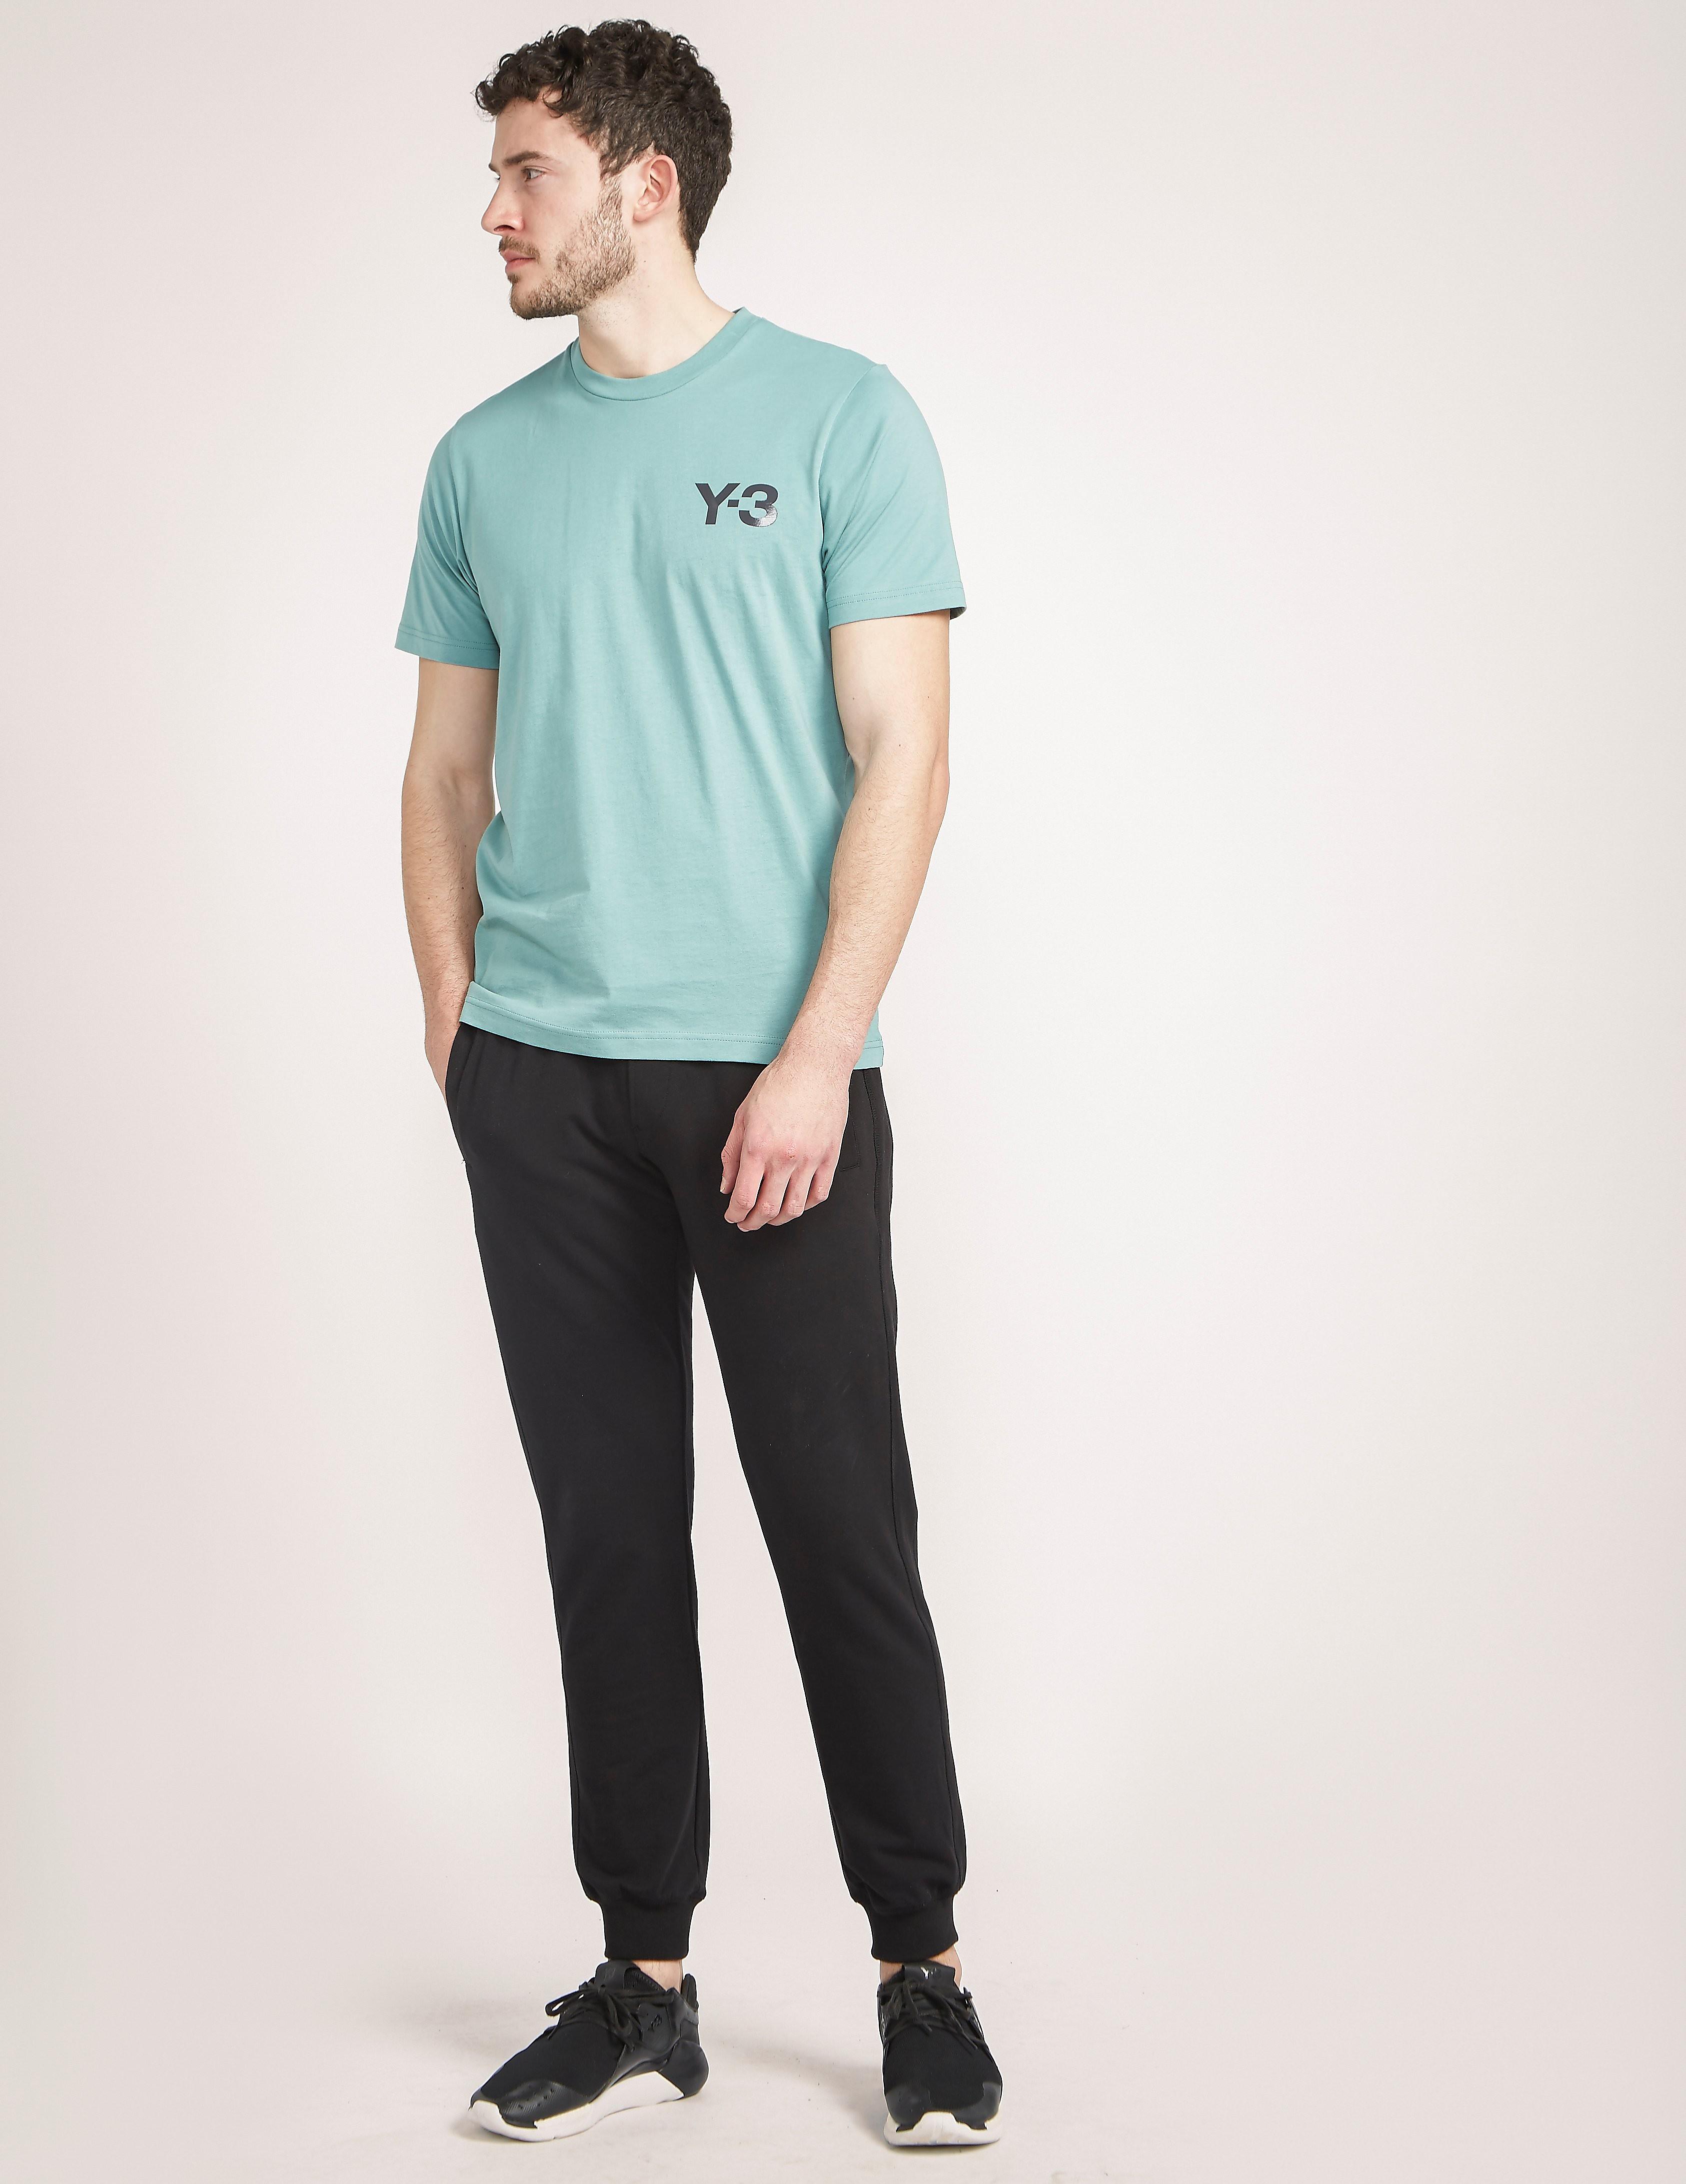 Y-3 Classic Short Sleeve T-Shirt